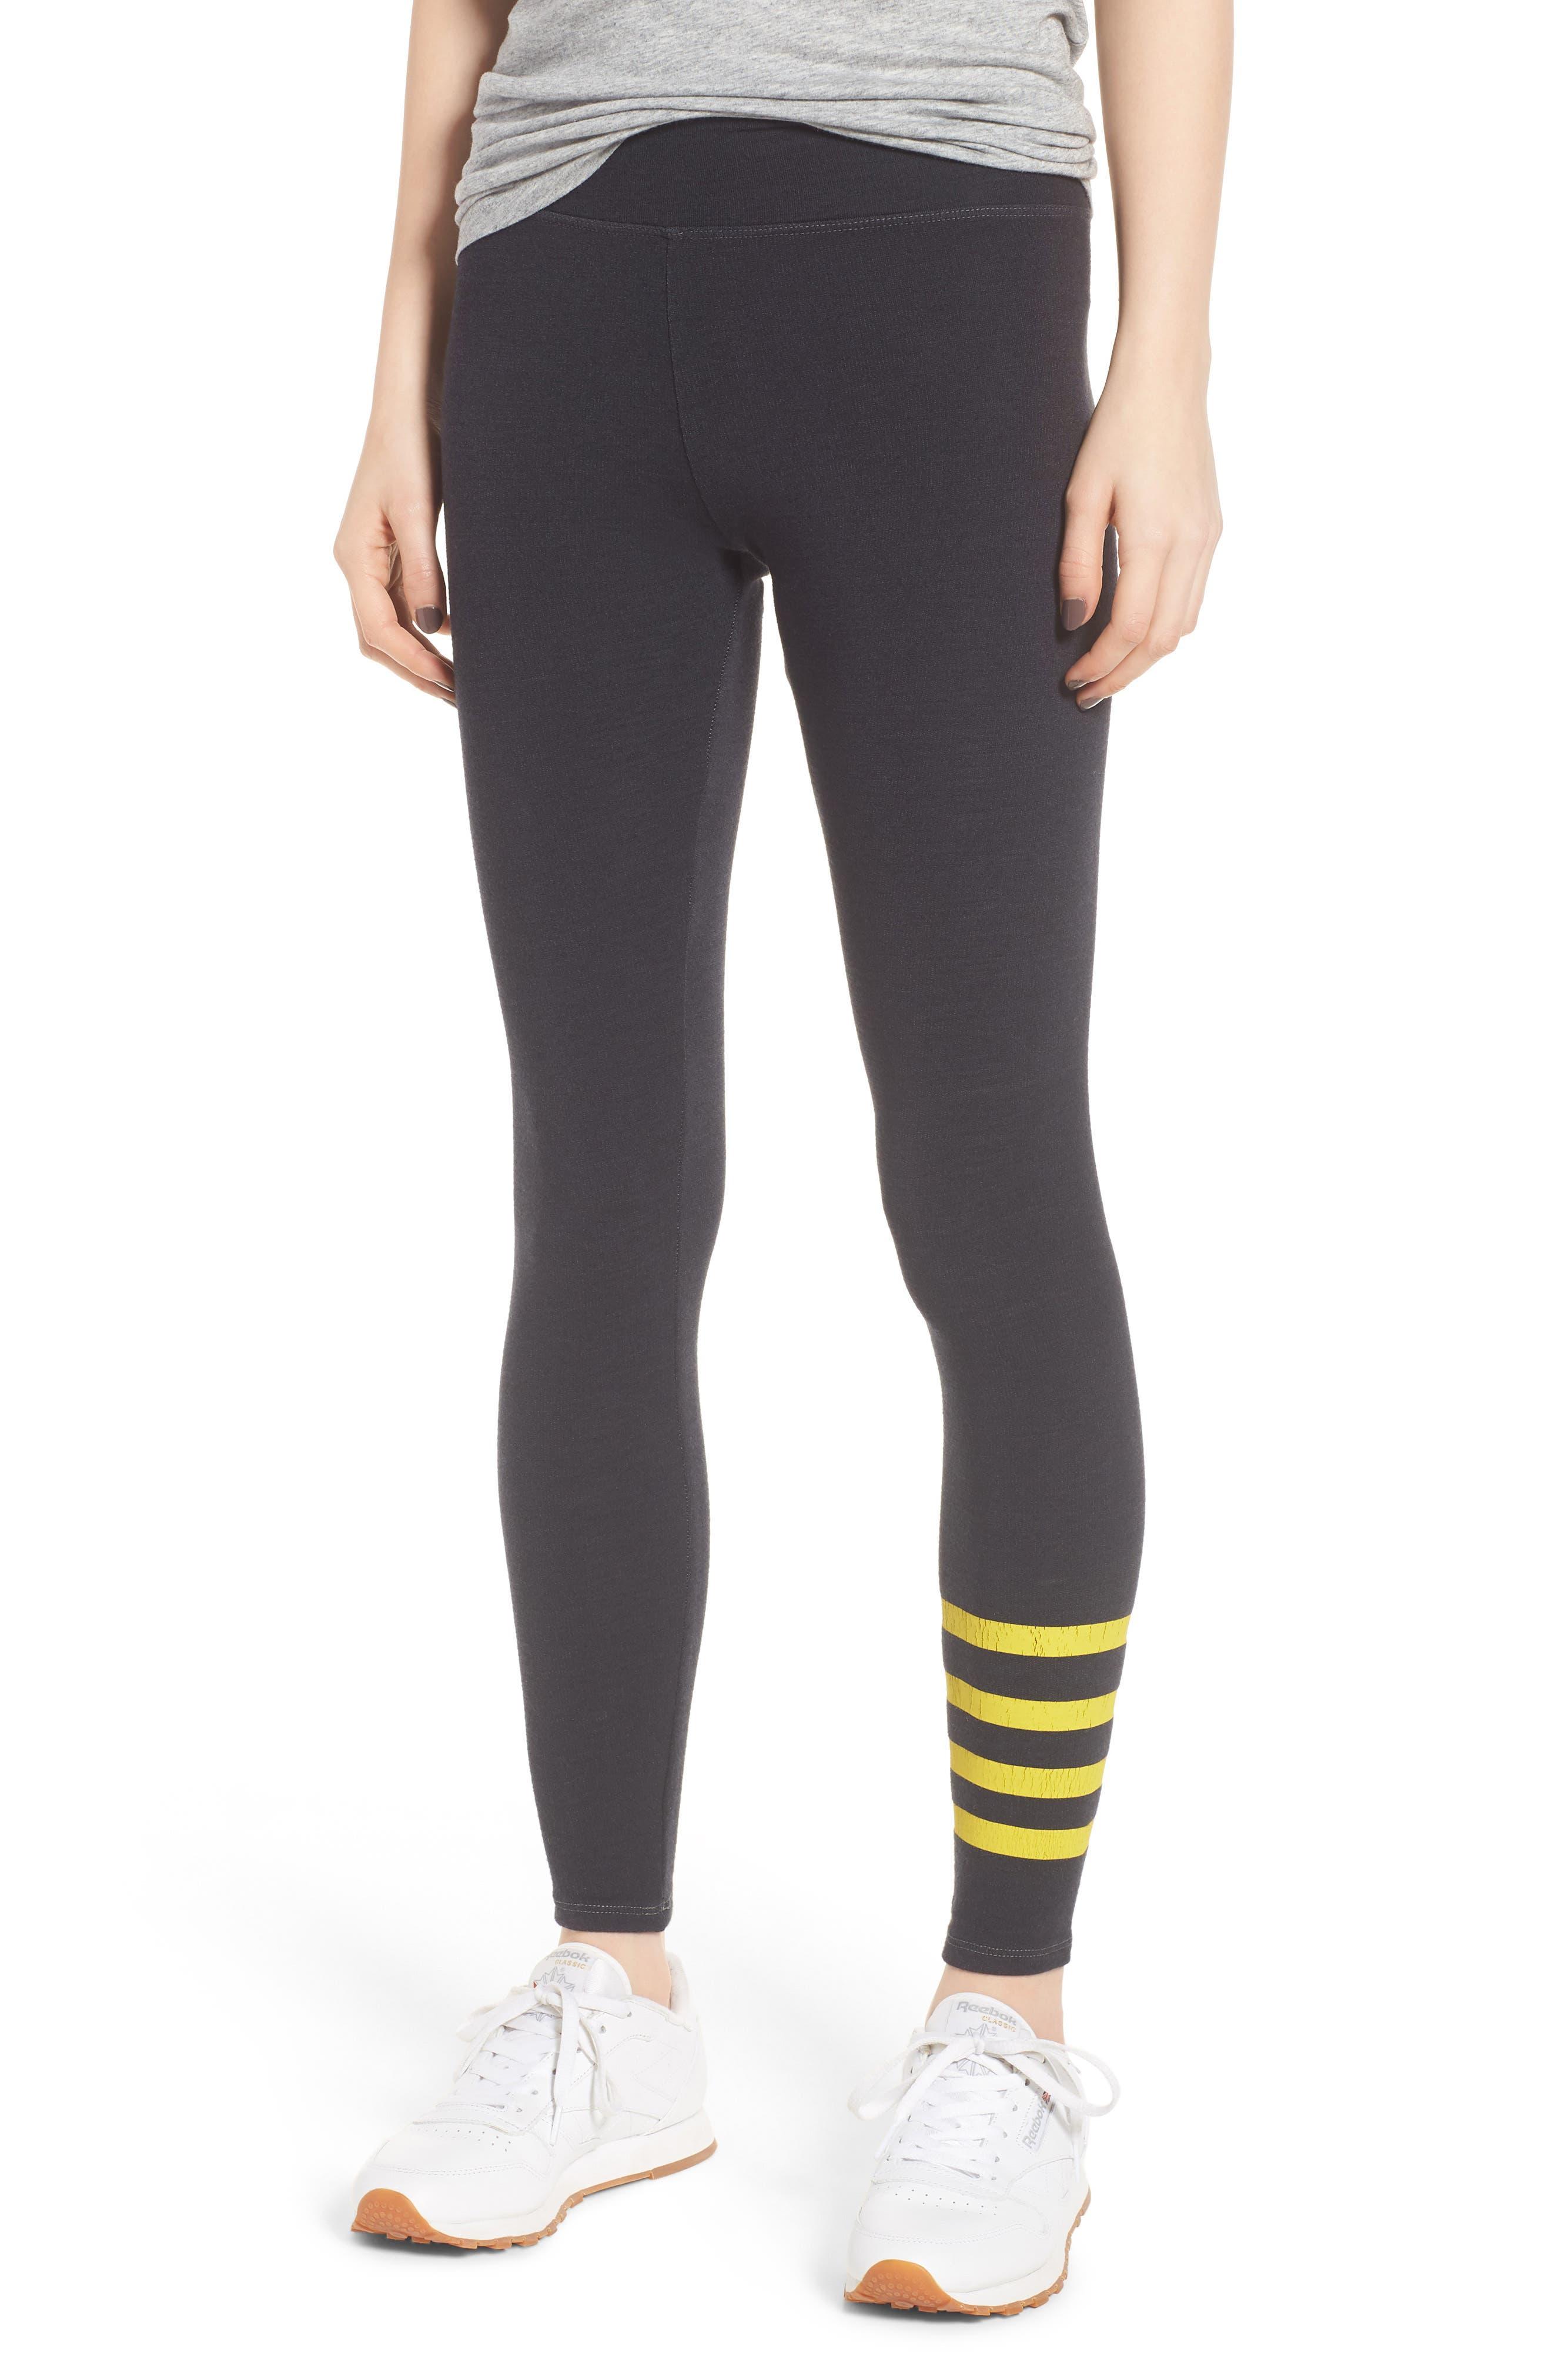 Stripe Yoga Pants,                         Main,                         color, Old Black